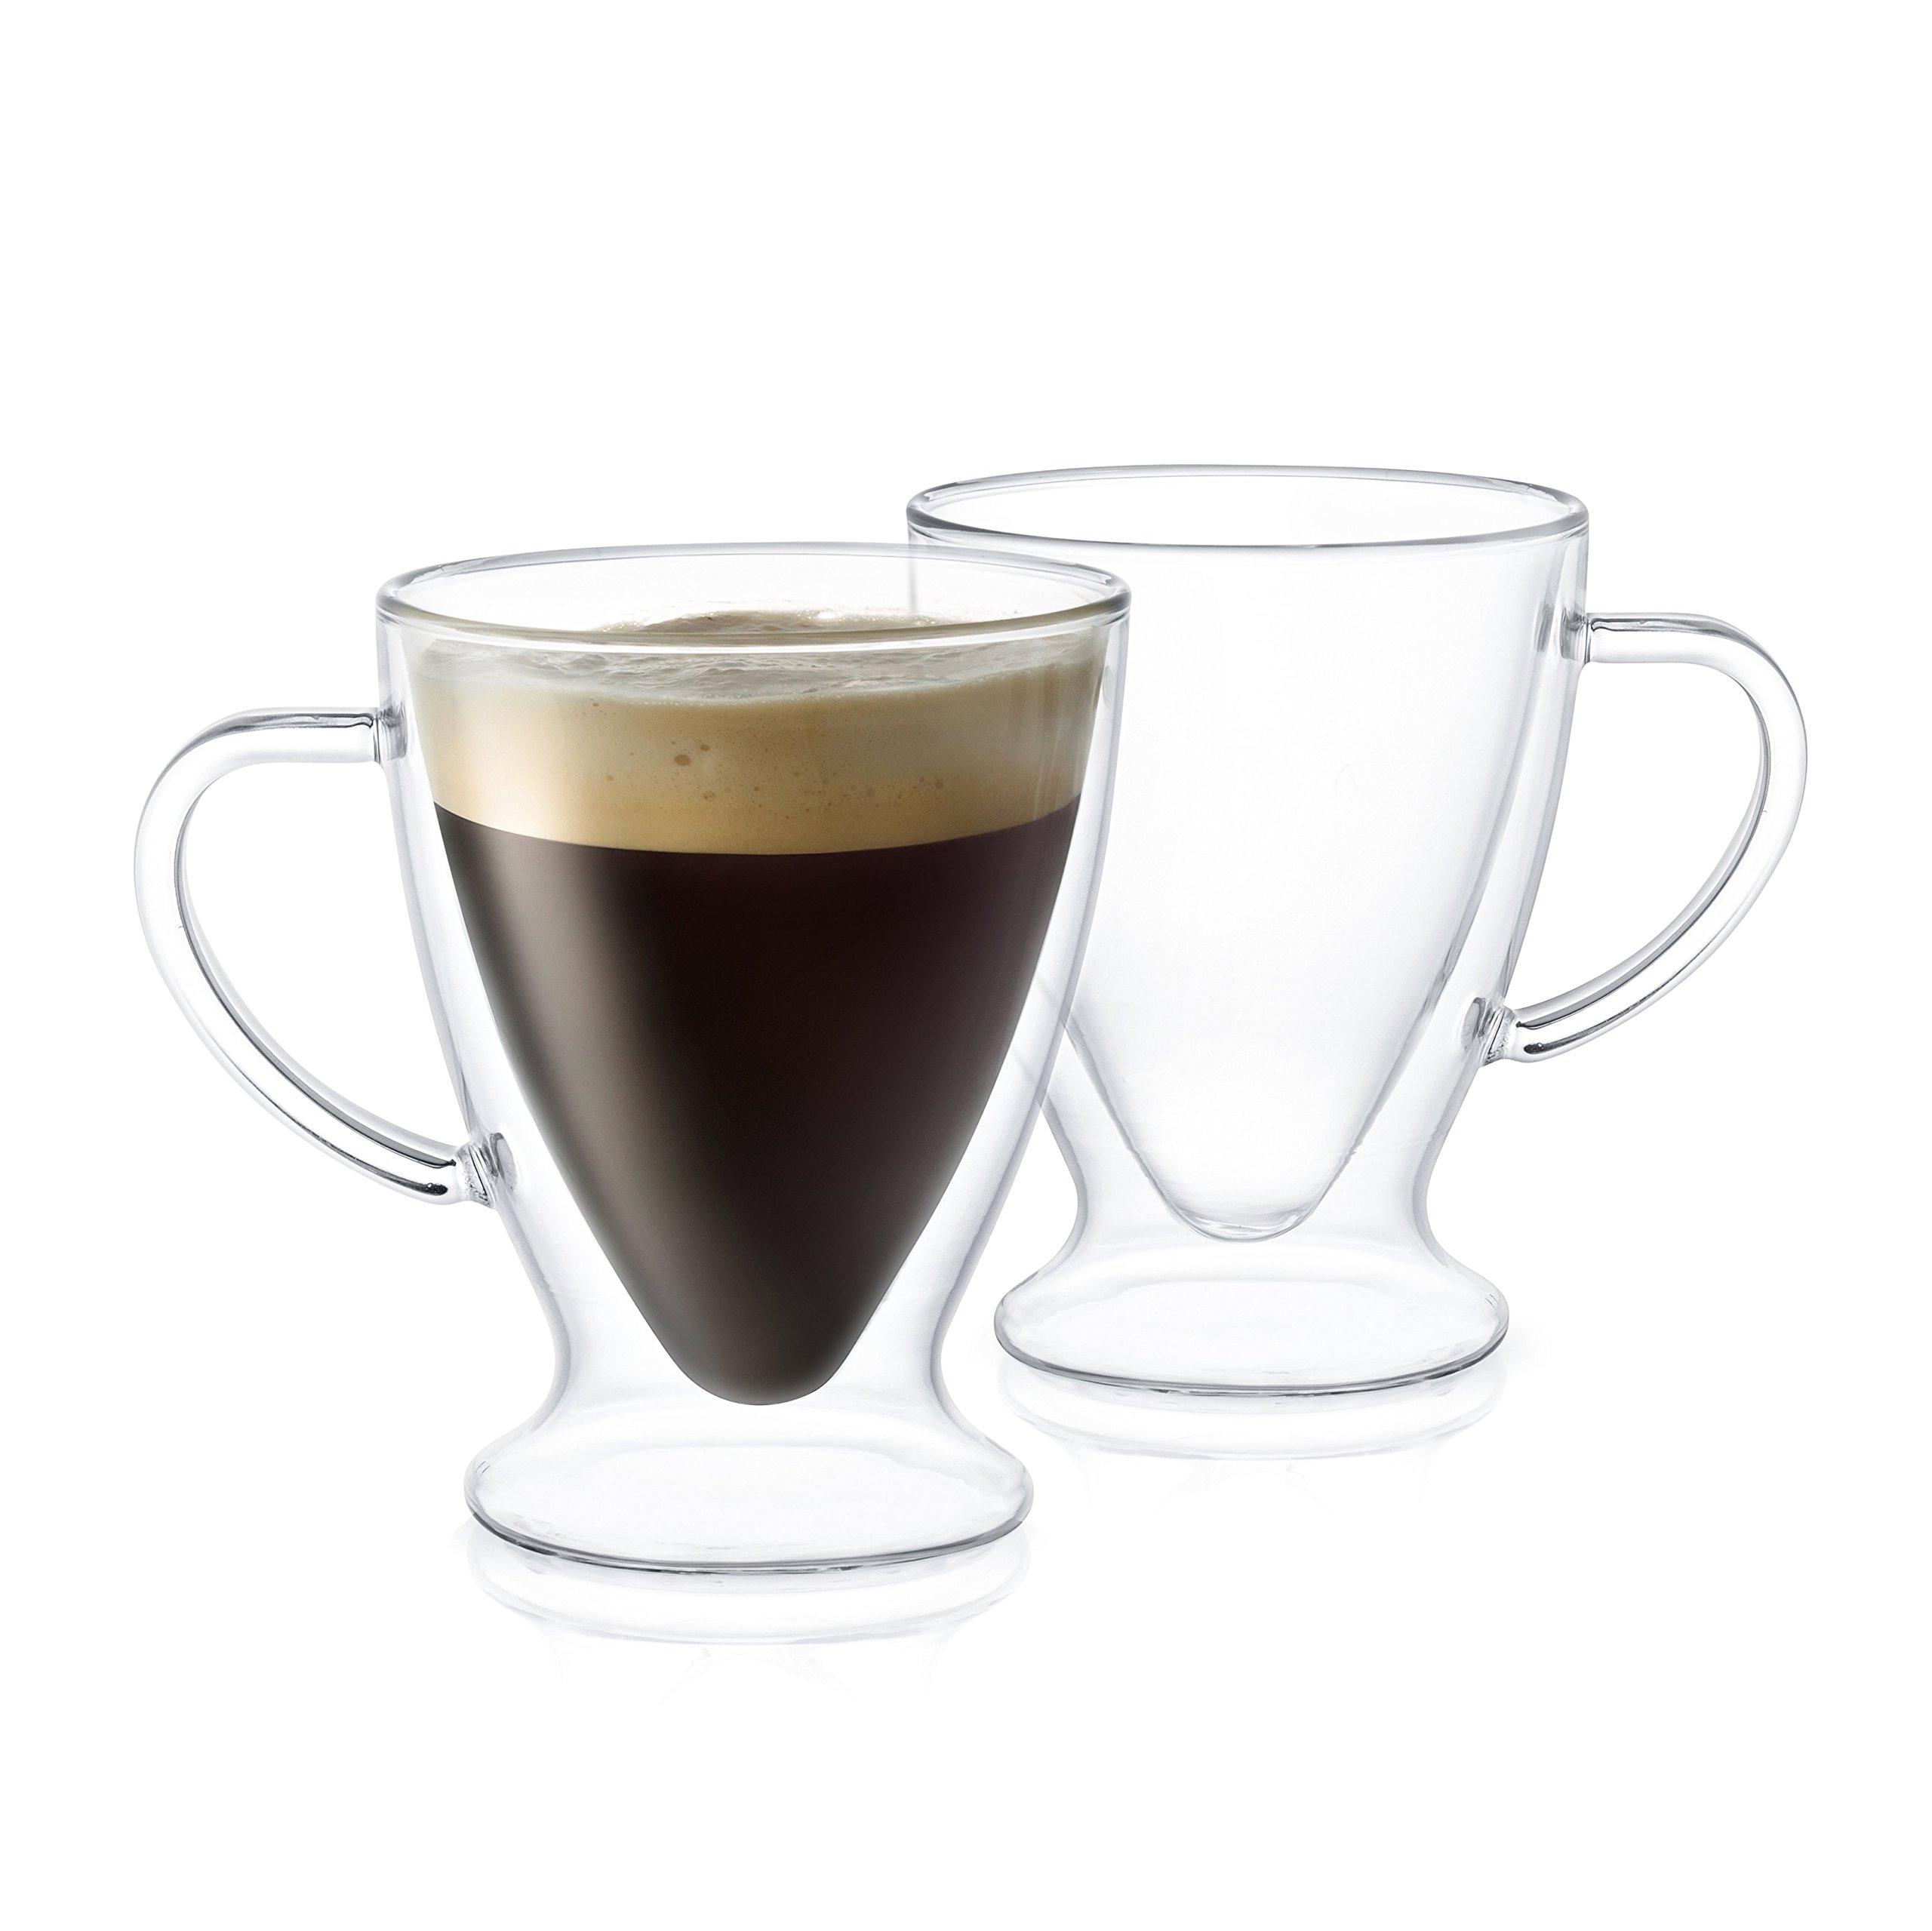 JoyJolt Declan Irish Double Wall Insulated Glasses Espresso Mugs, Set of 2 espresso Cups, 5-Ounces.